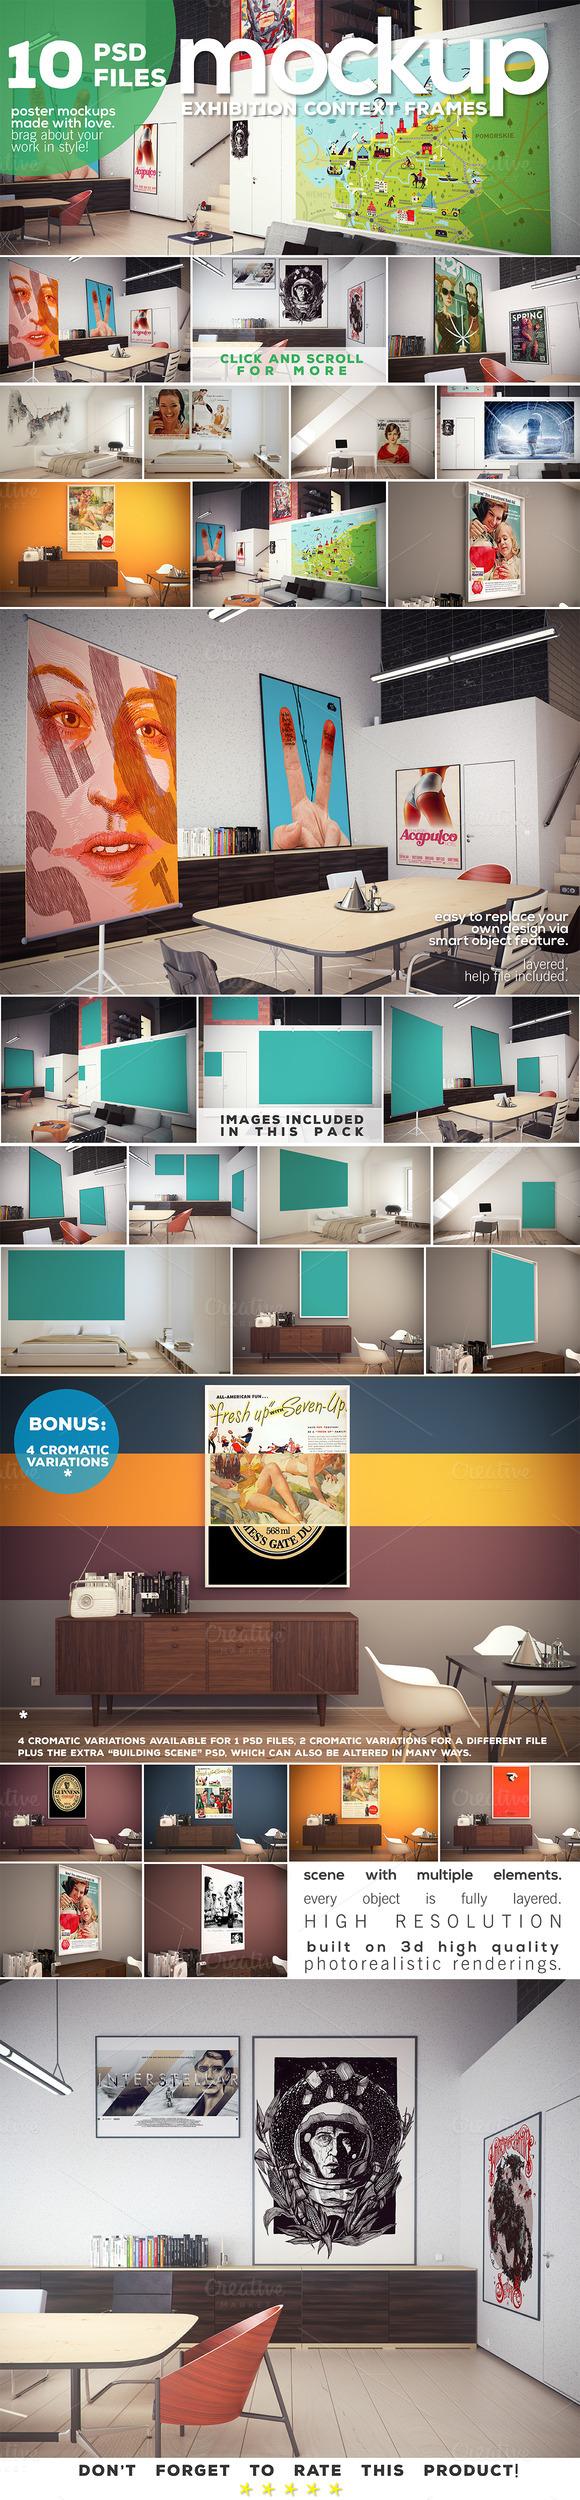 Poster Mockup vol.2 - Context Frames - Product Mockups